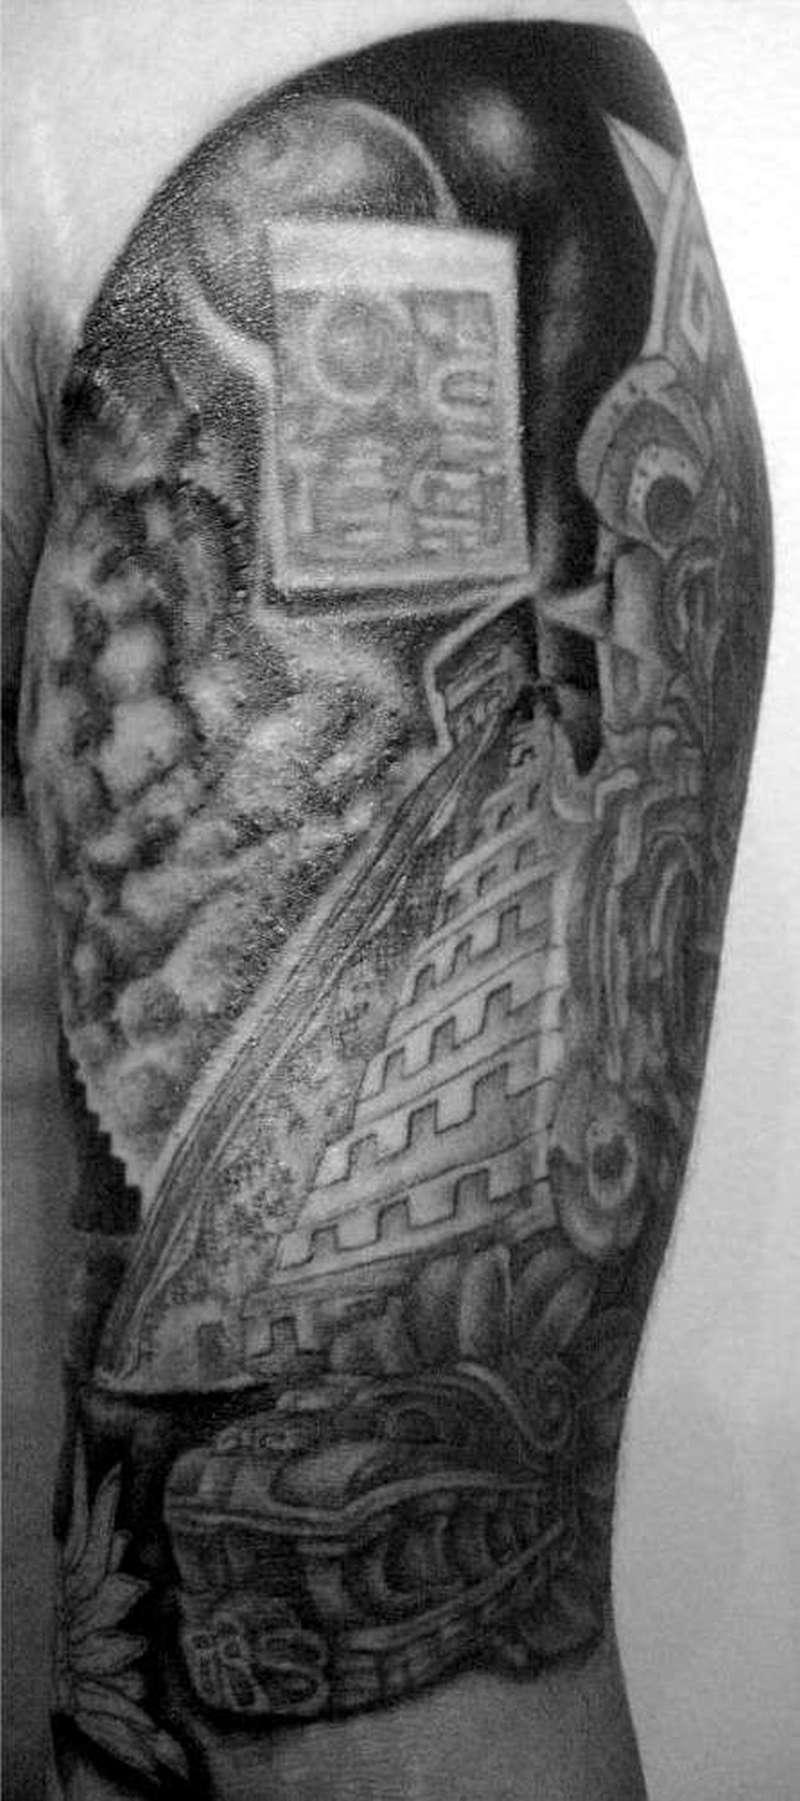 Aztec pyramid along with the dark energy tattoo